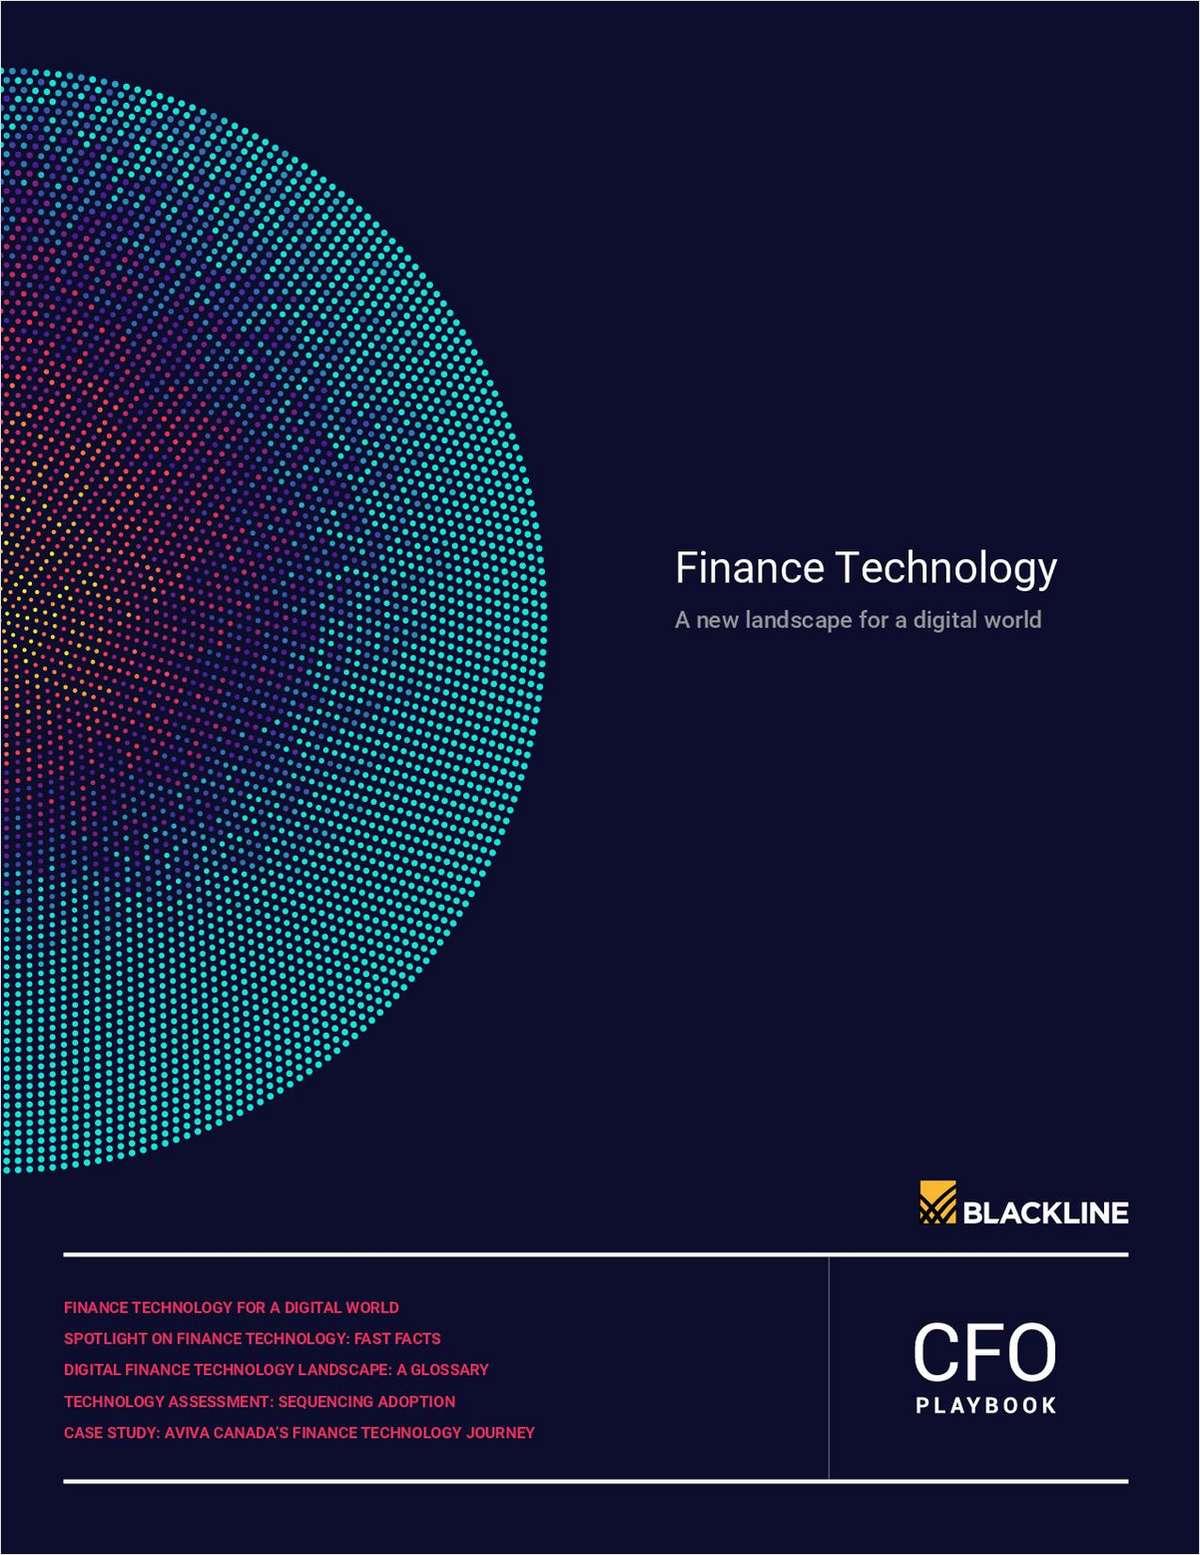 Finance Technology - A New Landscape for a Digital World